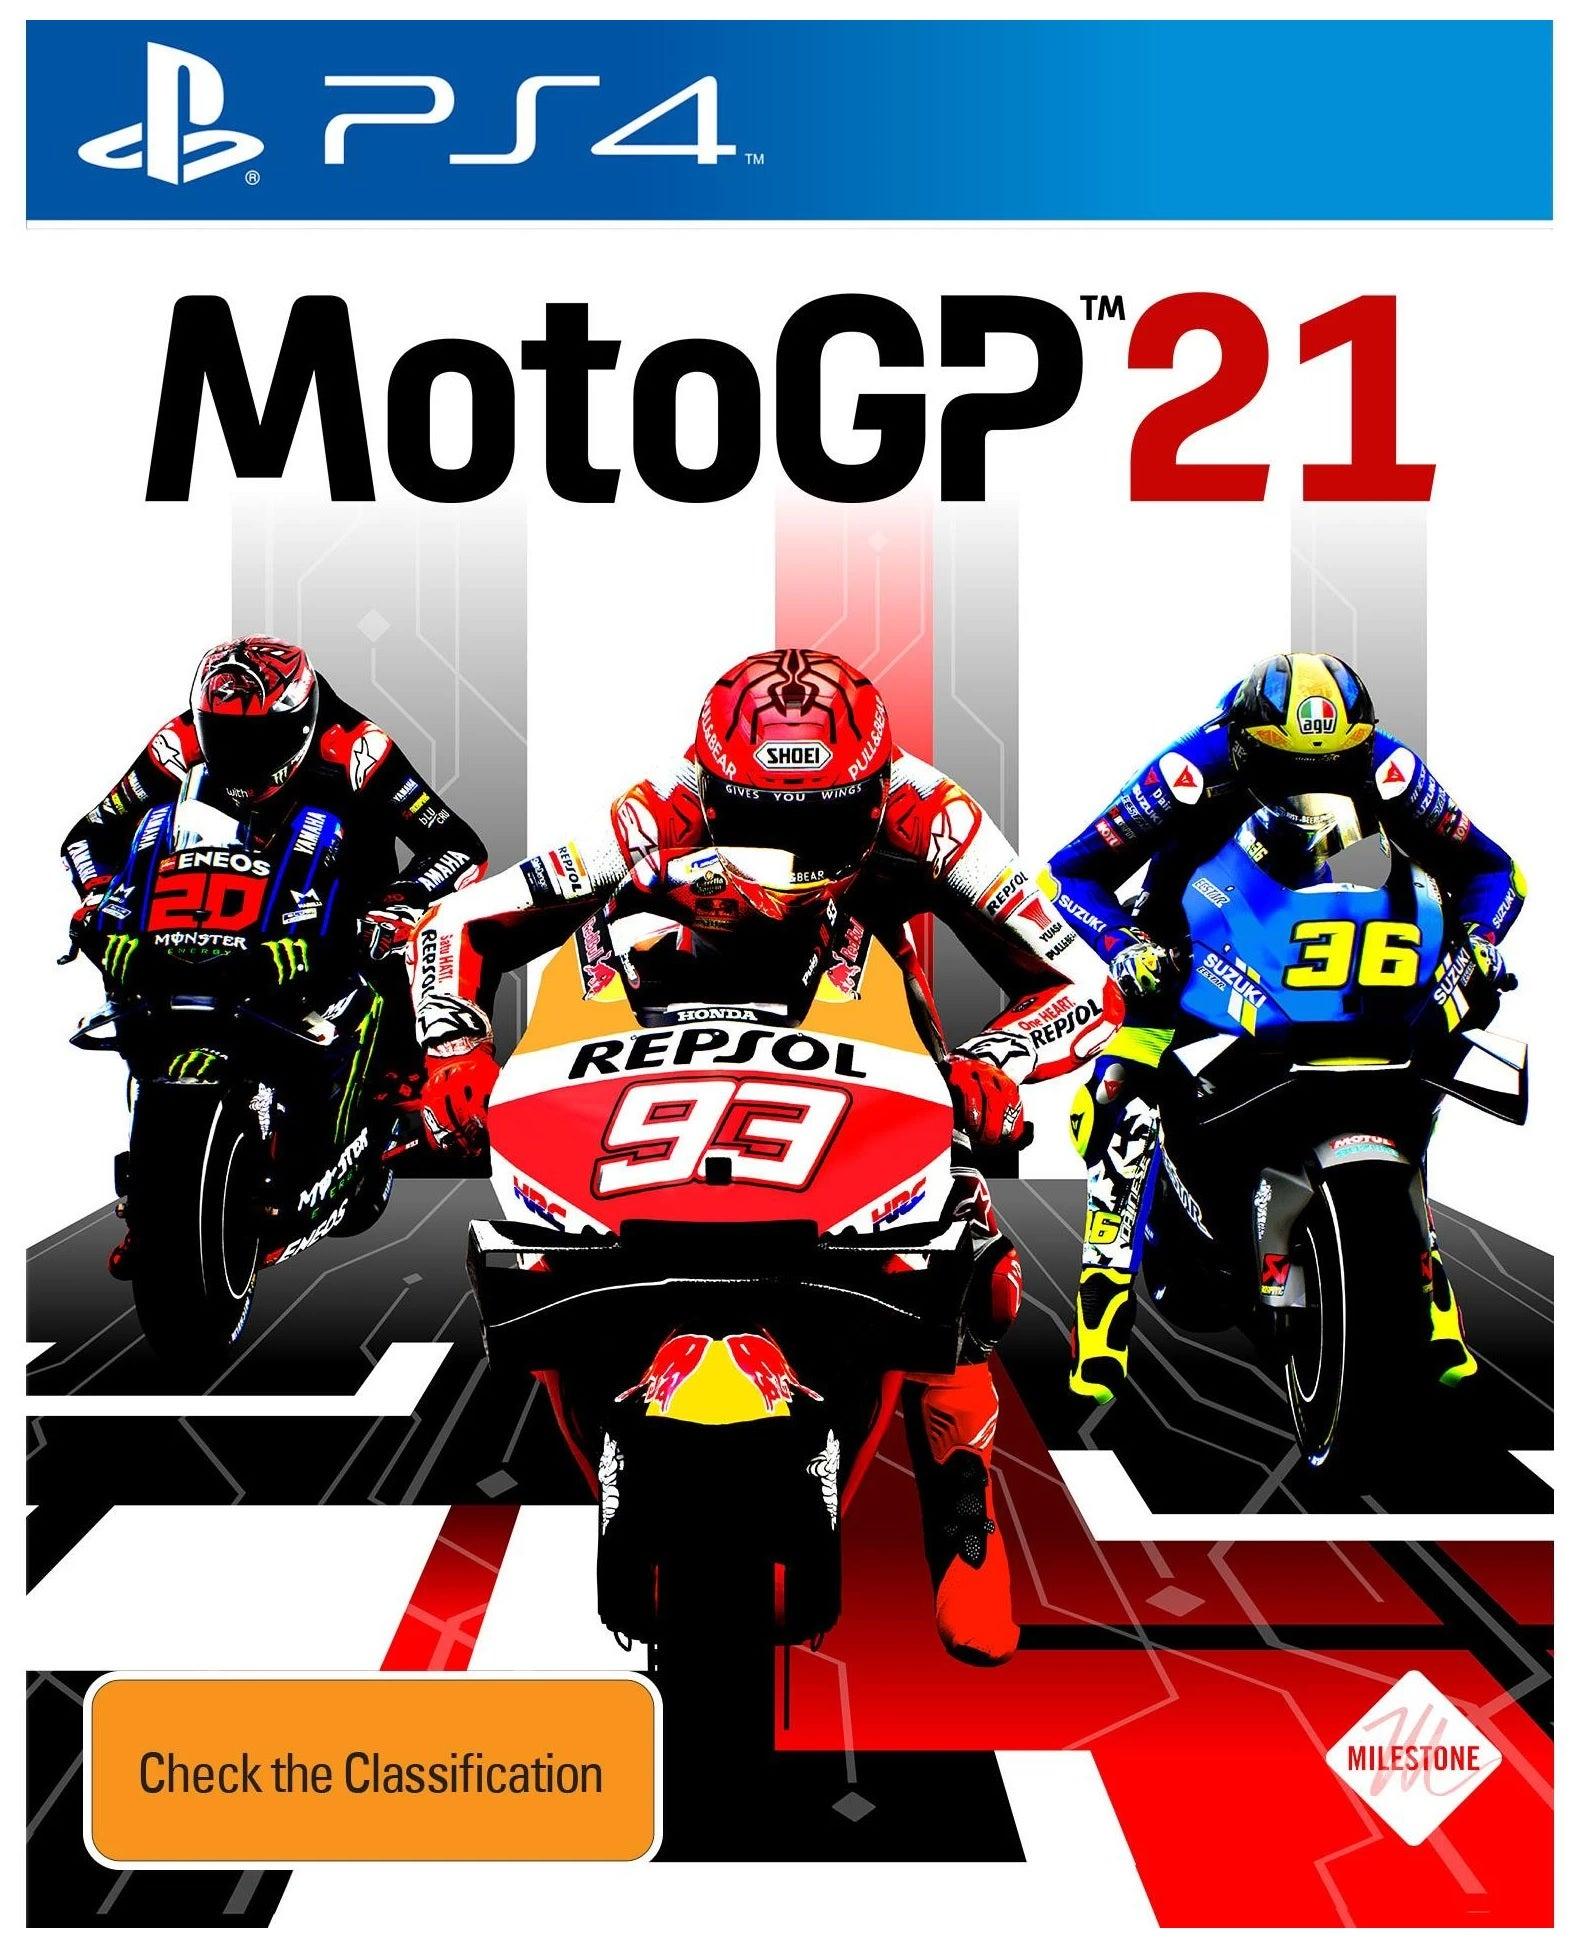 Milestone MotoGP 21 PS4 Playstation 4 Game